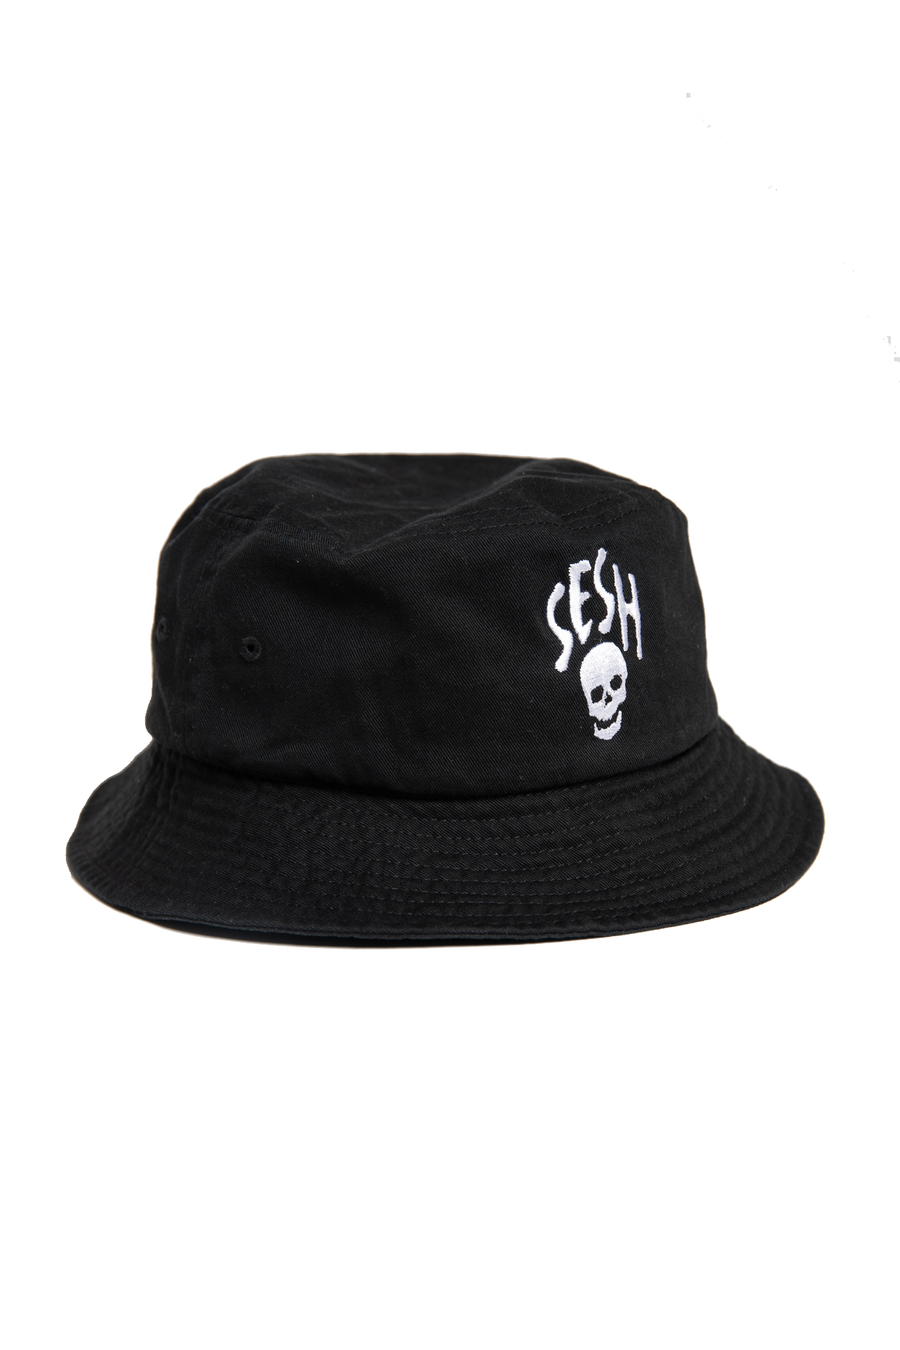 Image of Seshskull embroidered Bucket hat